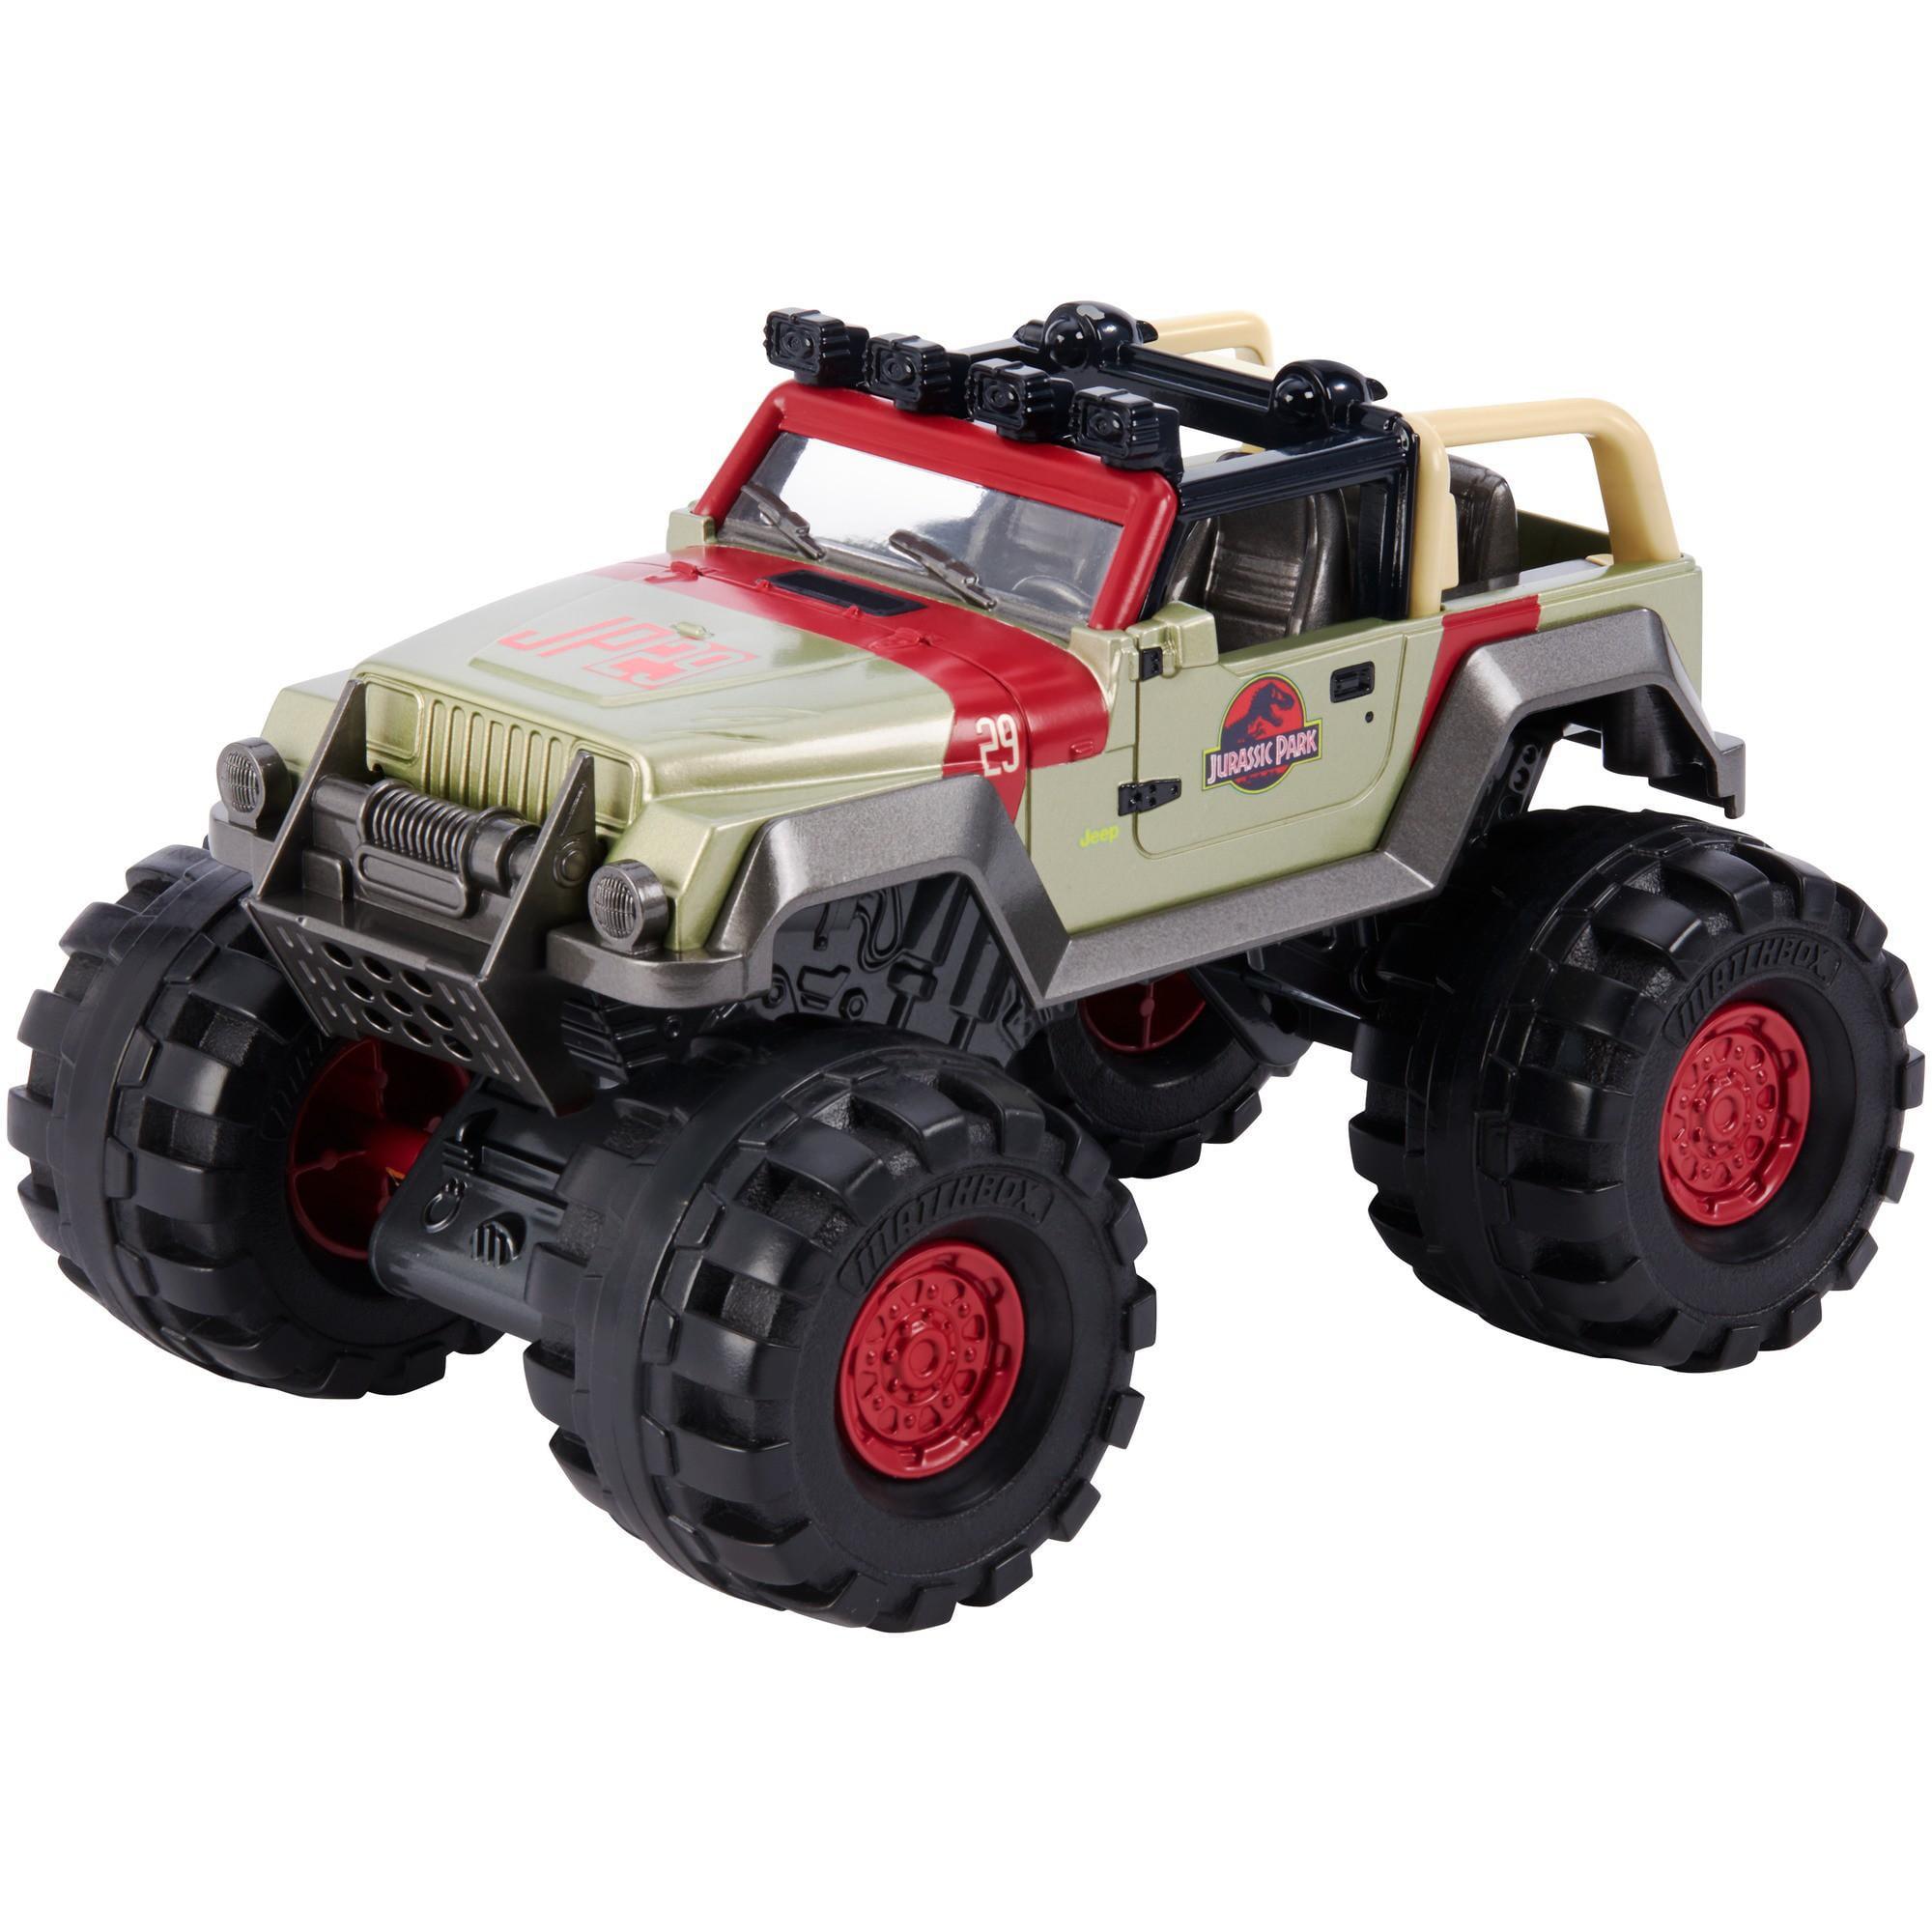 Matchbox Jurassic World '93 Jeep Wrangler by Mattel